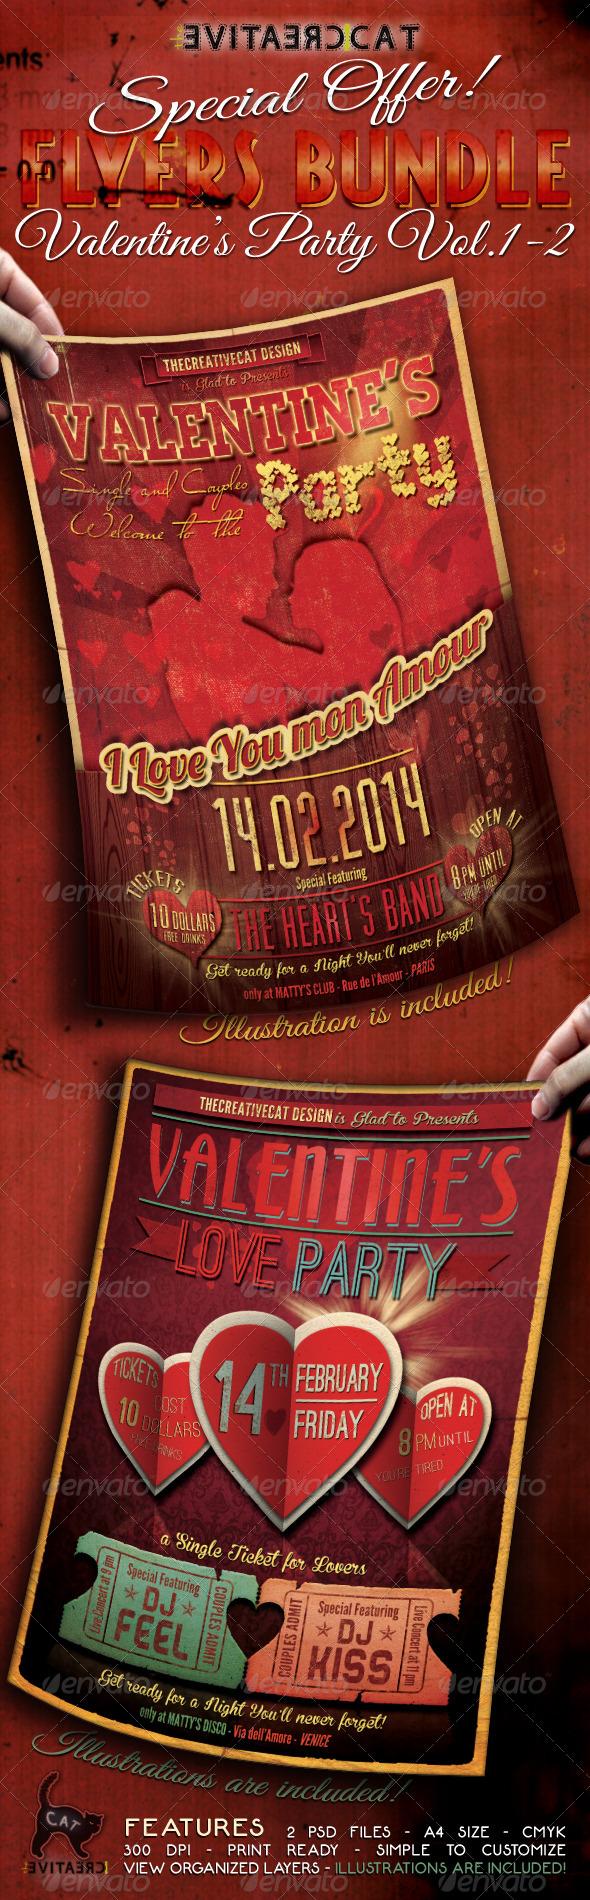 Valentine's Party Flyer/Poster Bundle Vol. 1-2 - Events Flyers